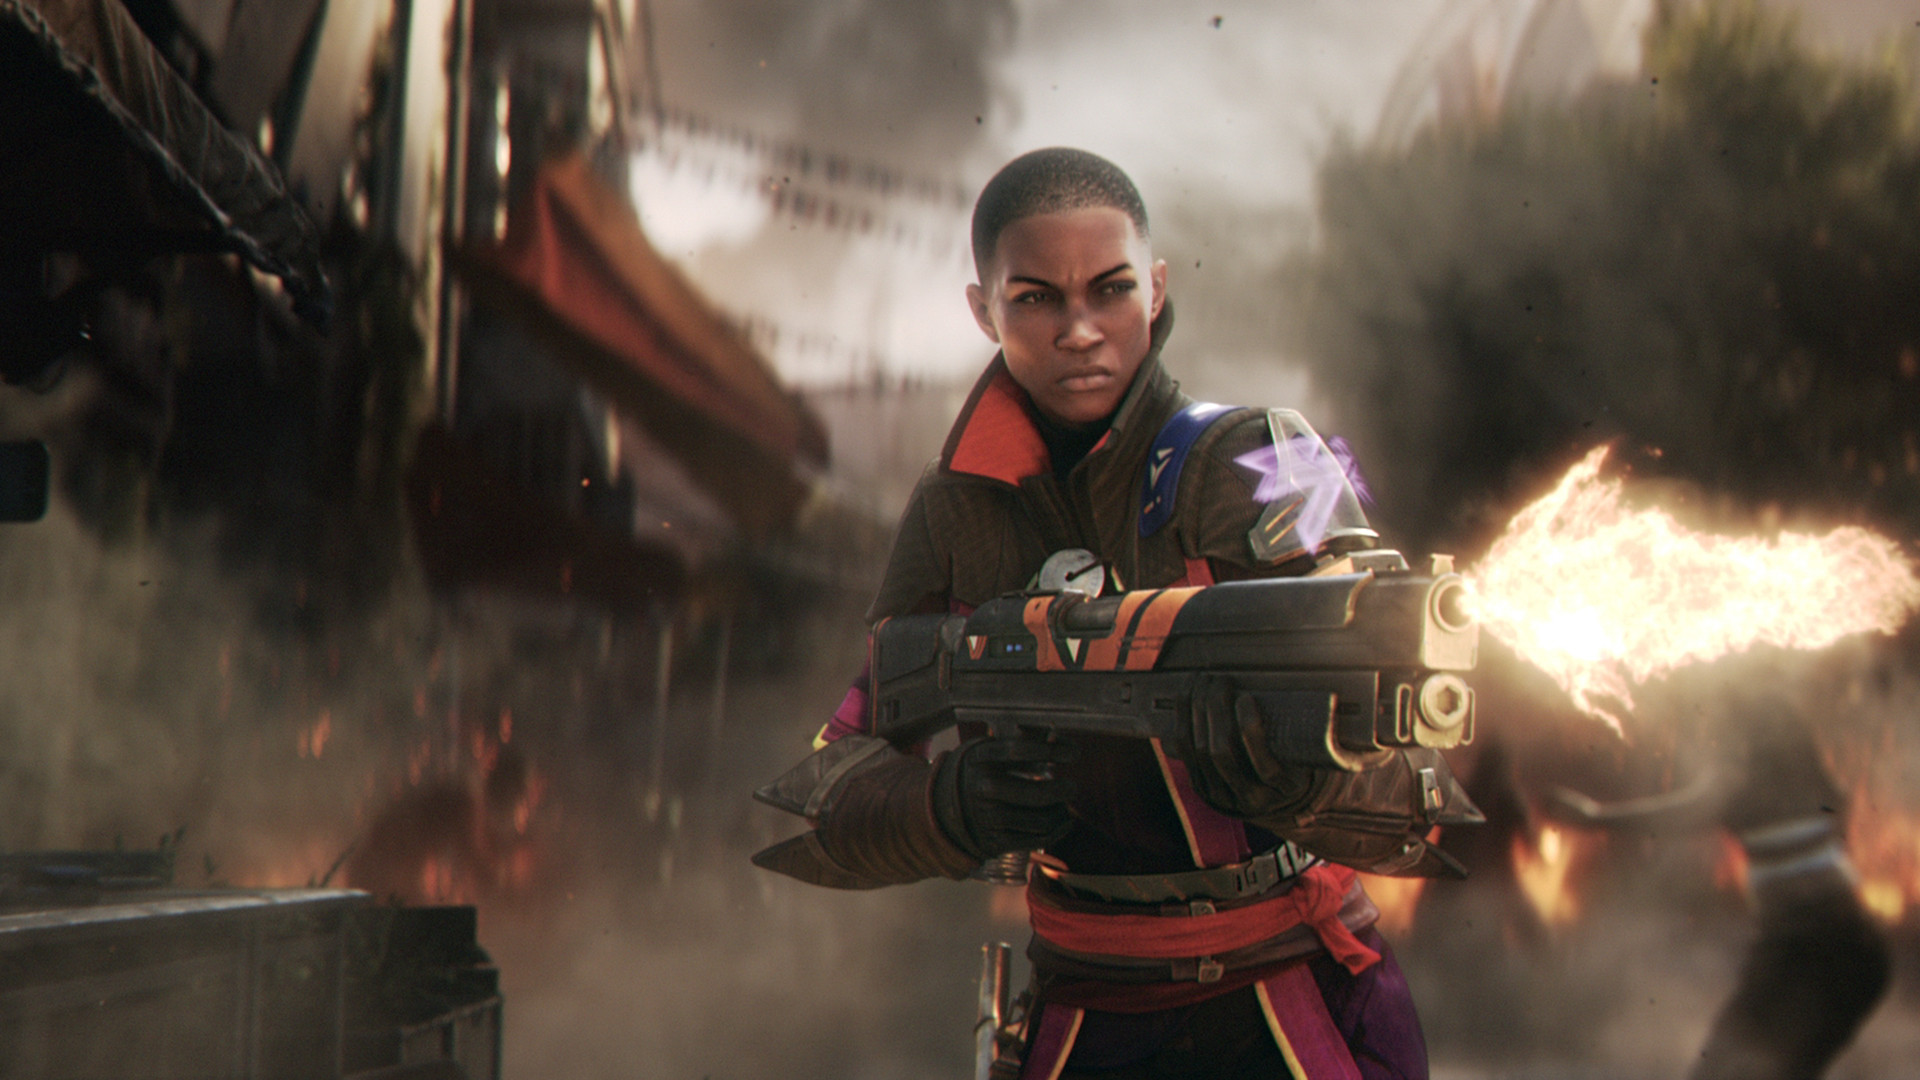 Destiny-2-Hope-walkthrough-guide-How-to-kill-Ubara-Hive-Prince